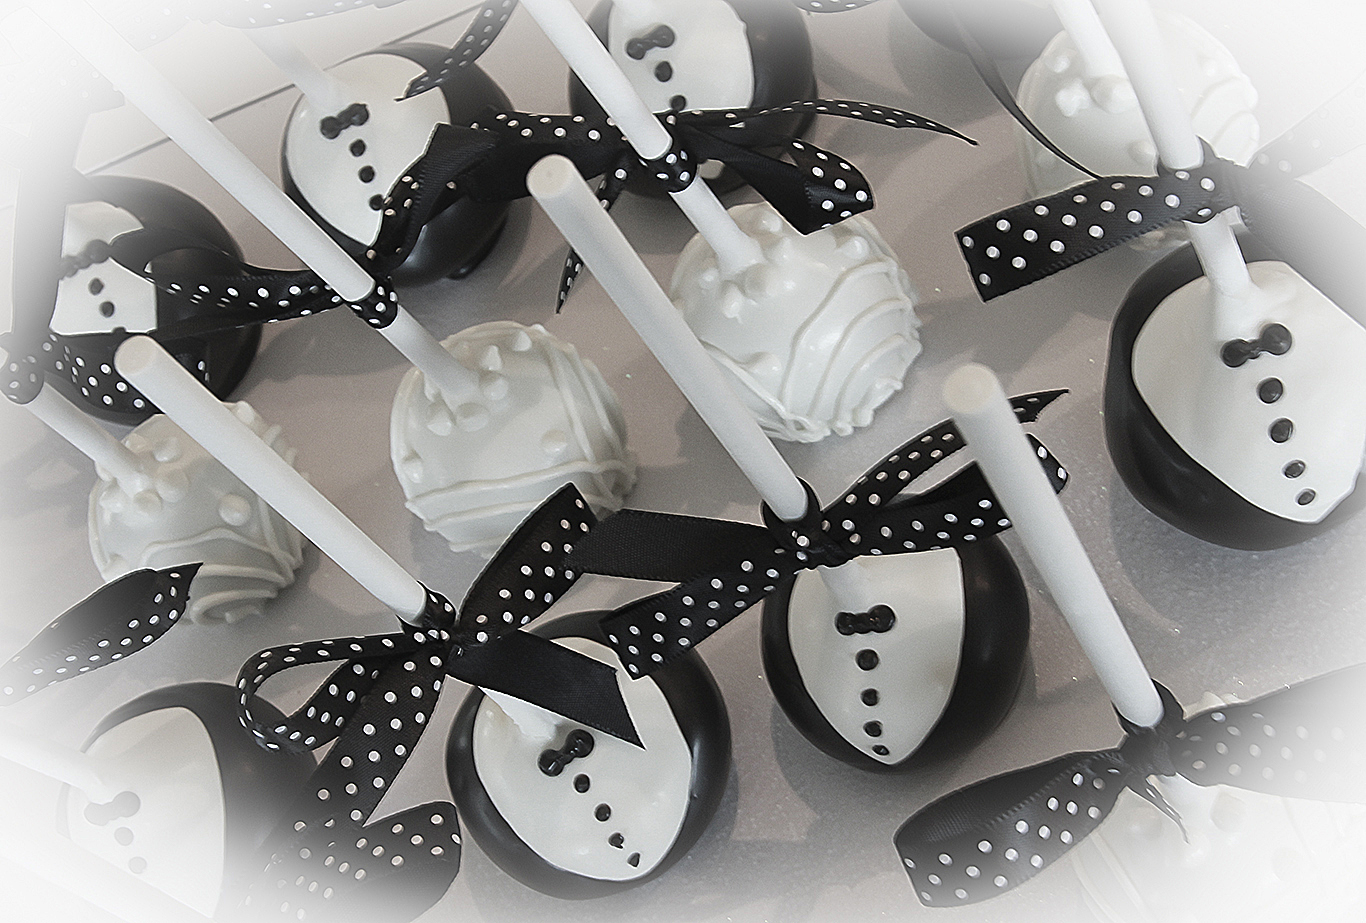 bride and groom wedding cake pops wedding cake pops Bride and Groom Wedding Cake Pops